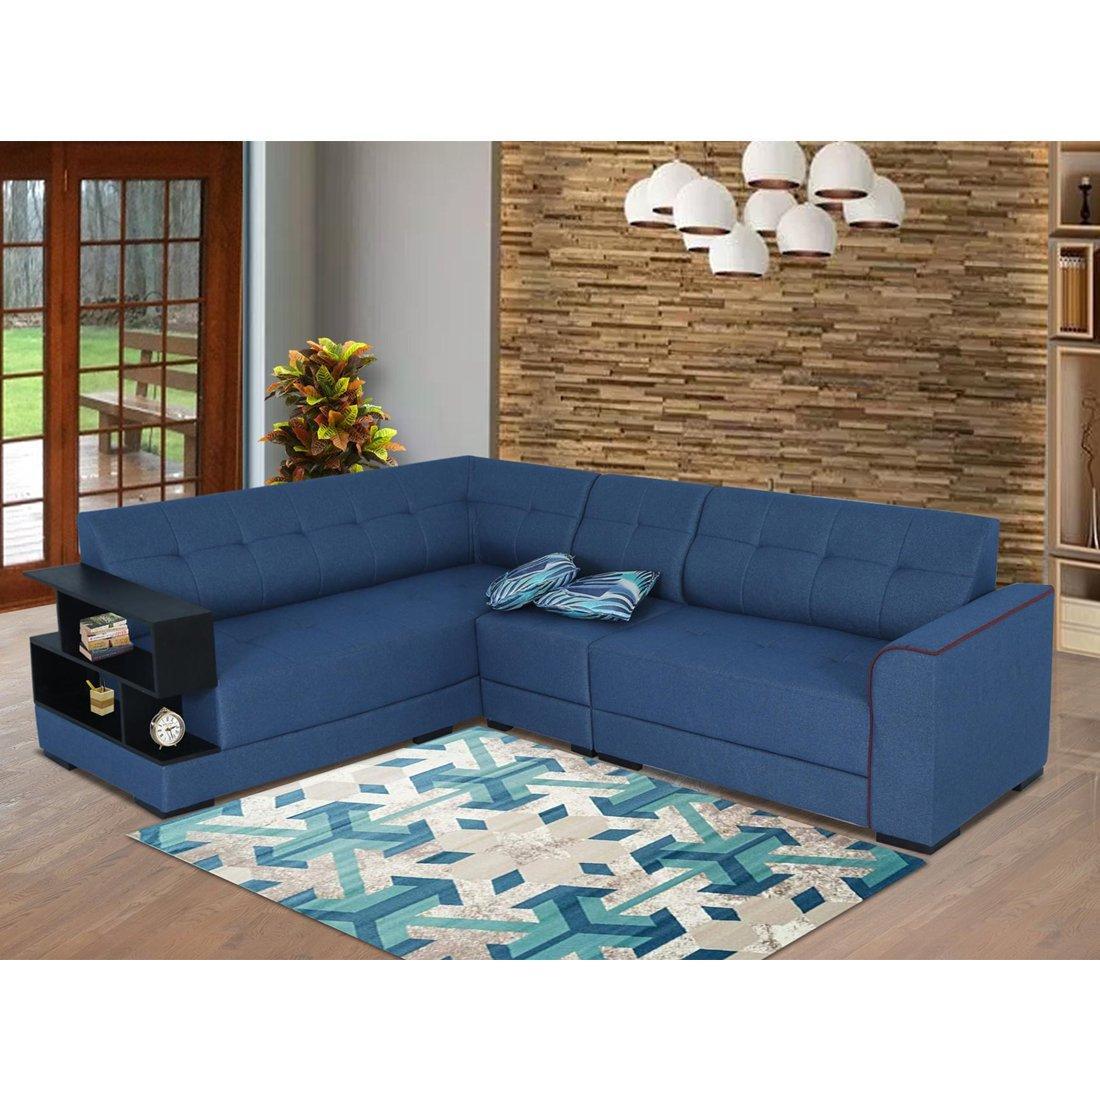 Buy Aleena Fabric 6 Seater L Shape Sofa Left Blue Online Evok